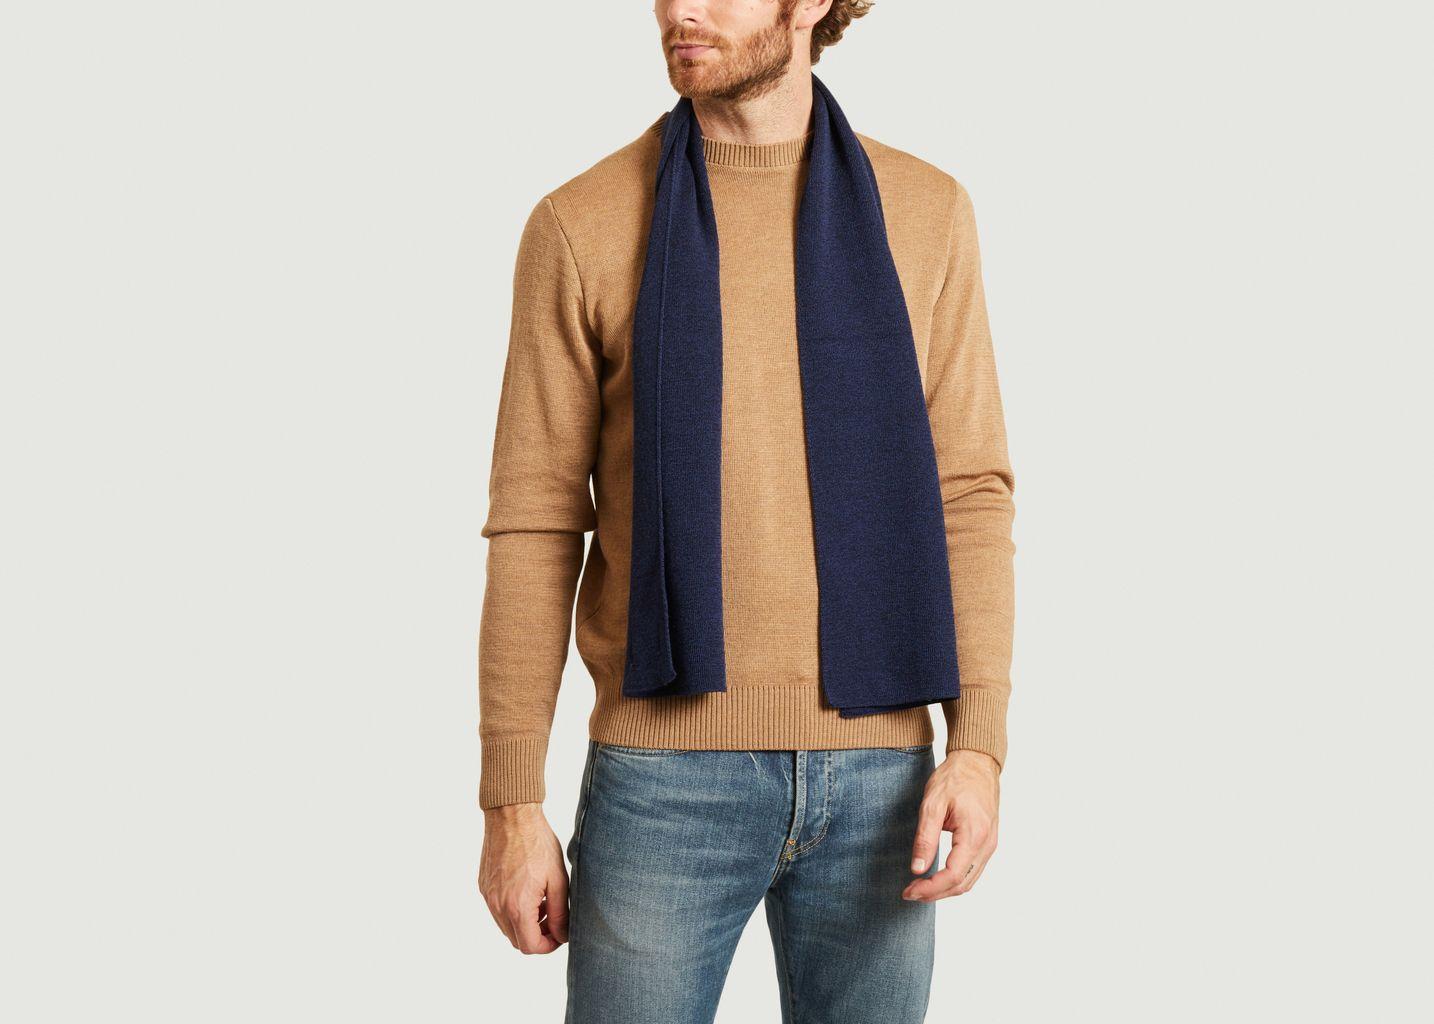 Echarpe en laine mérinos - JagVi